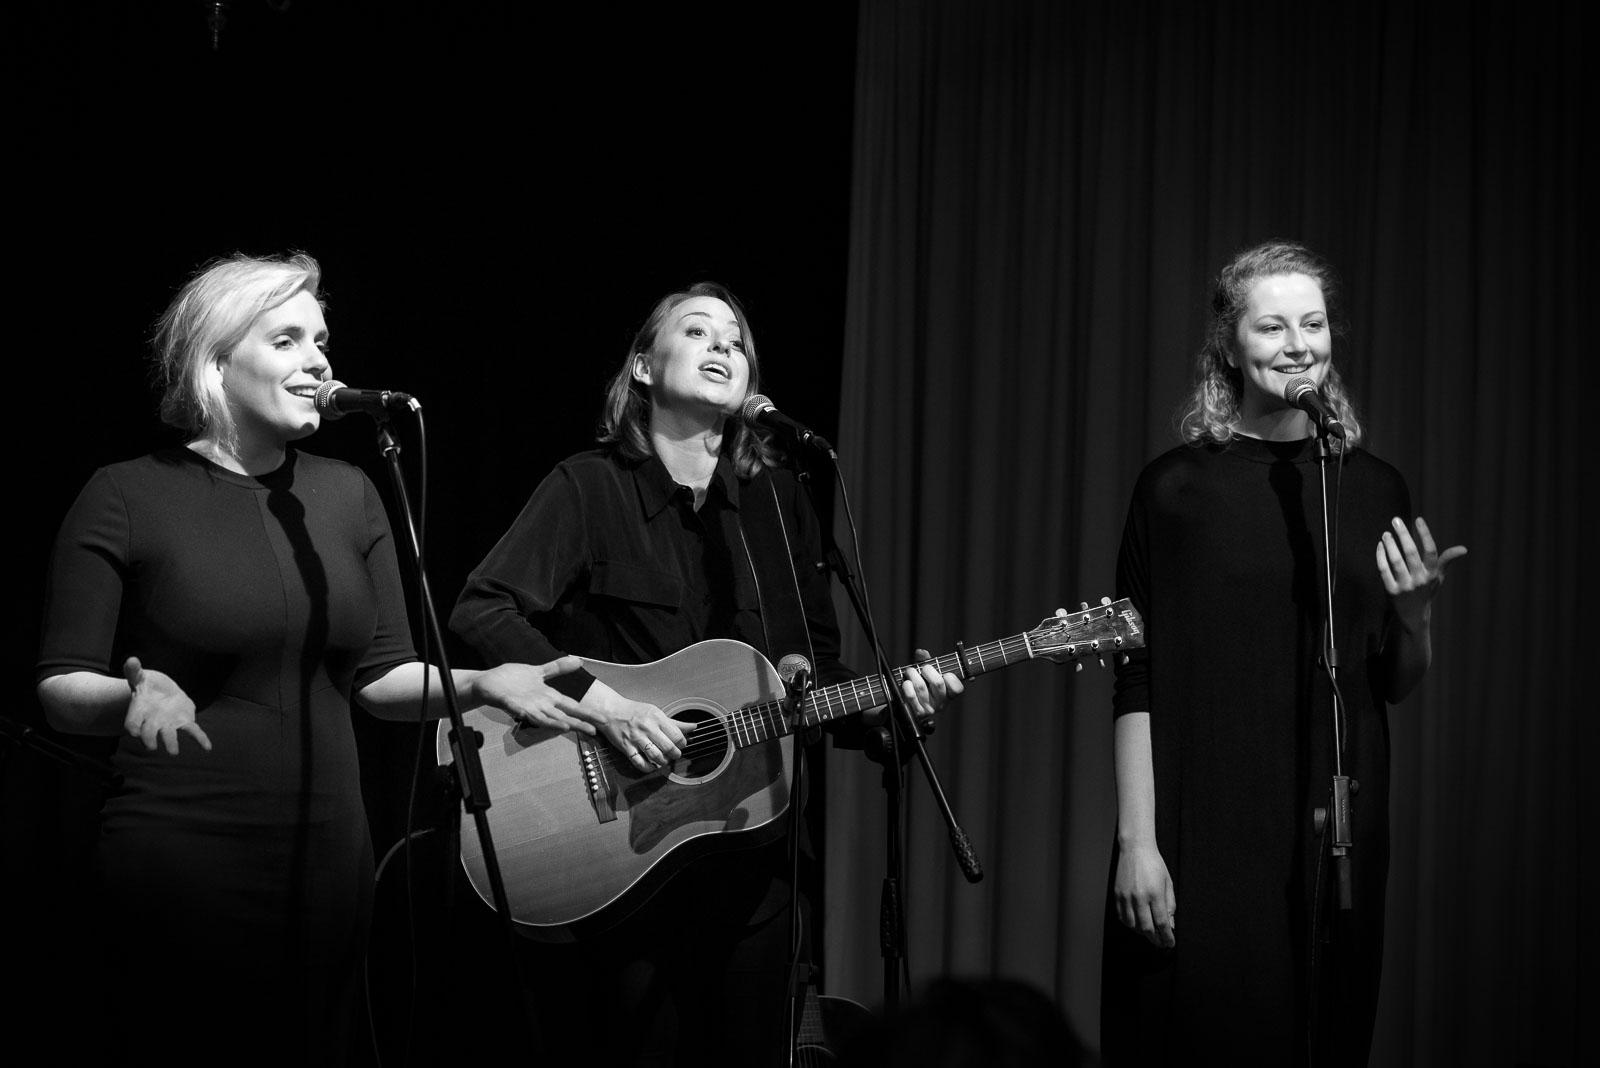 Stephanie Struijk backing vocals Parelsessies Concertfoto